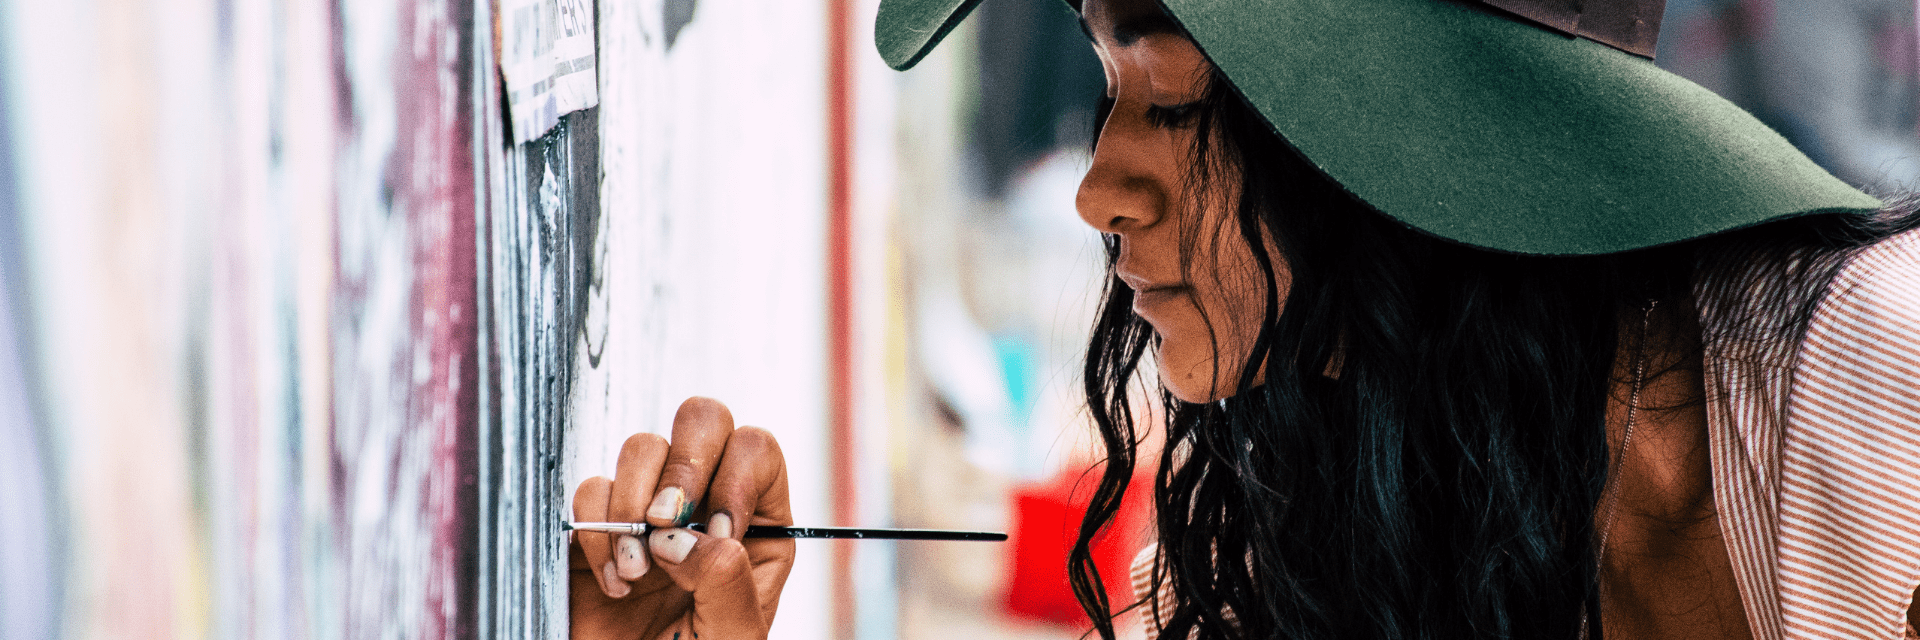 artist paints wall